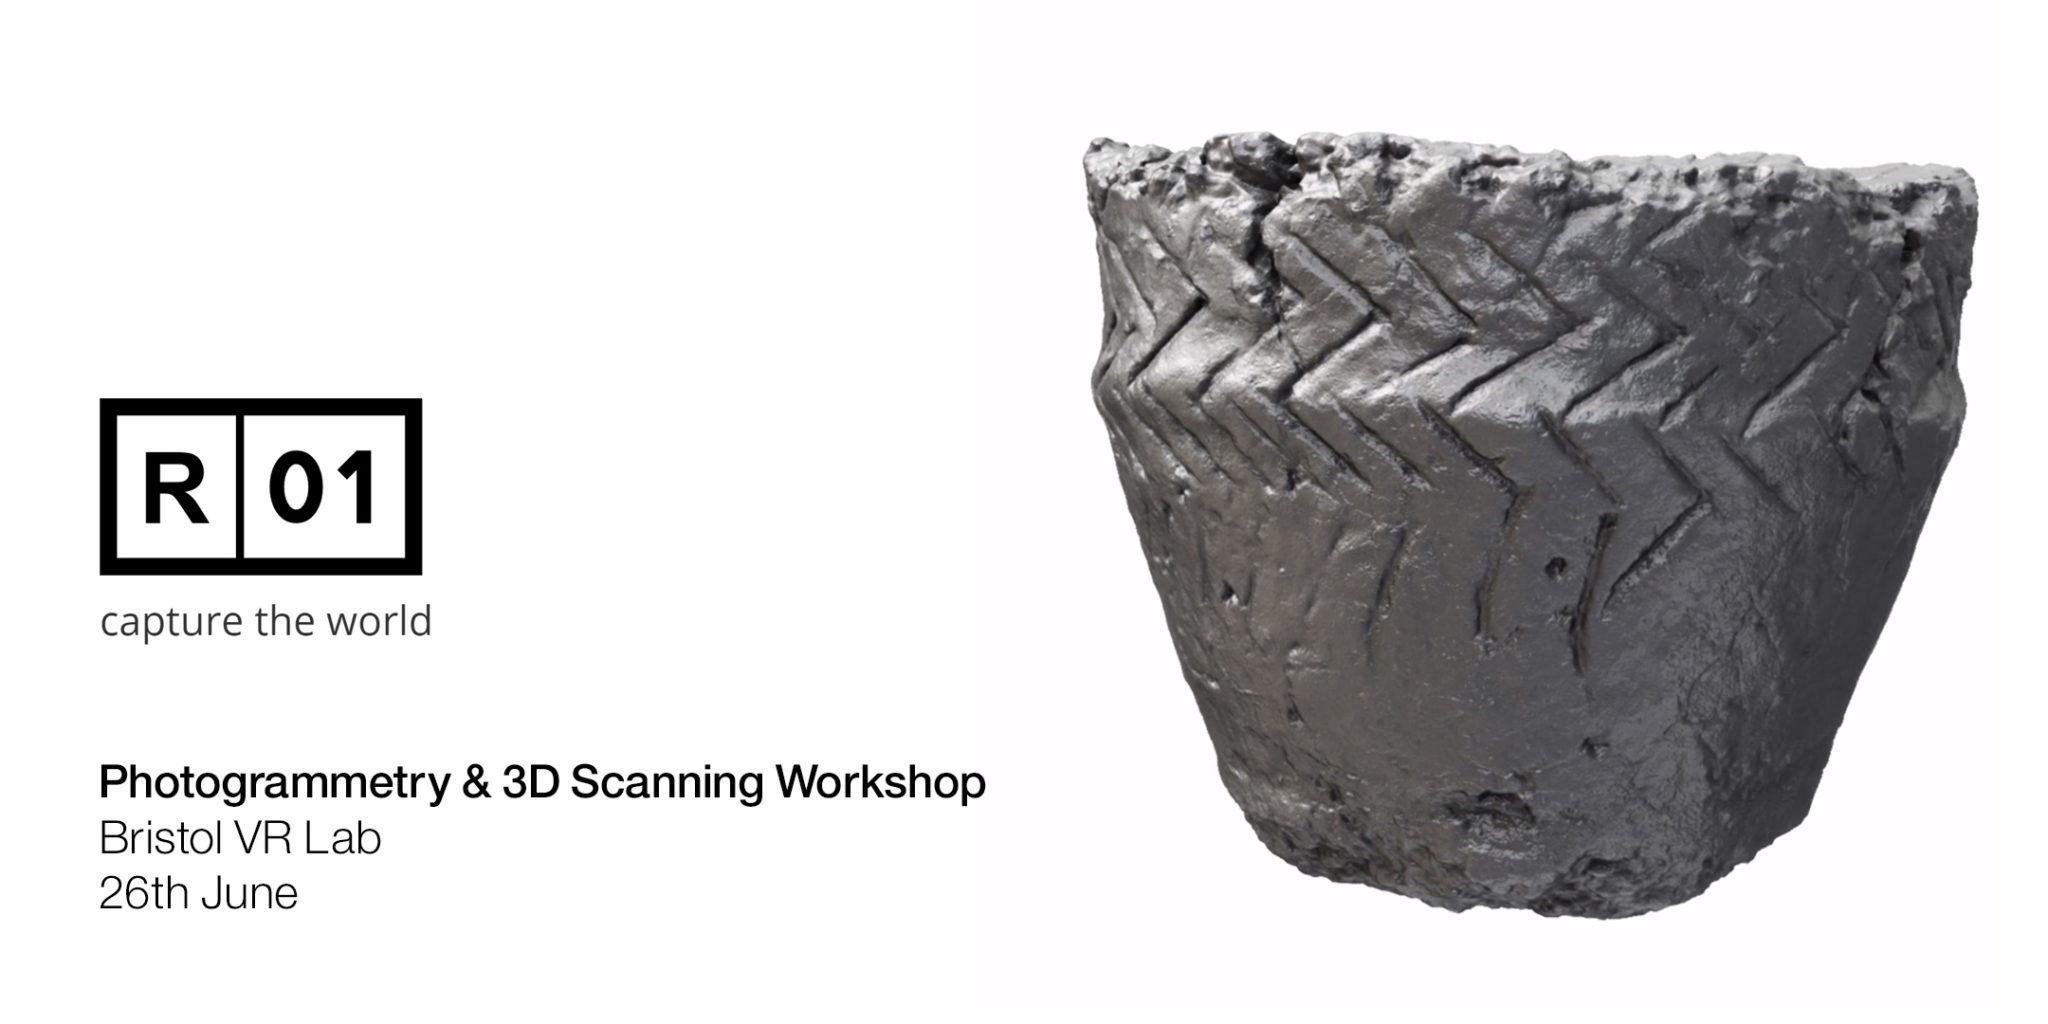 Bristol VR Lab – Reality01 3D Scanning & Photogrammetry Workshop